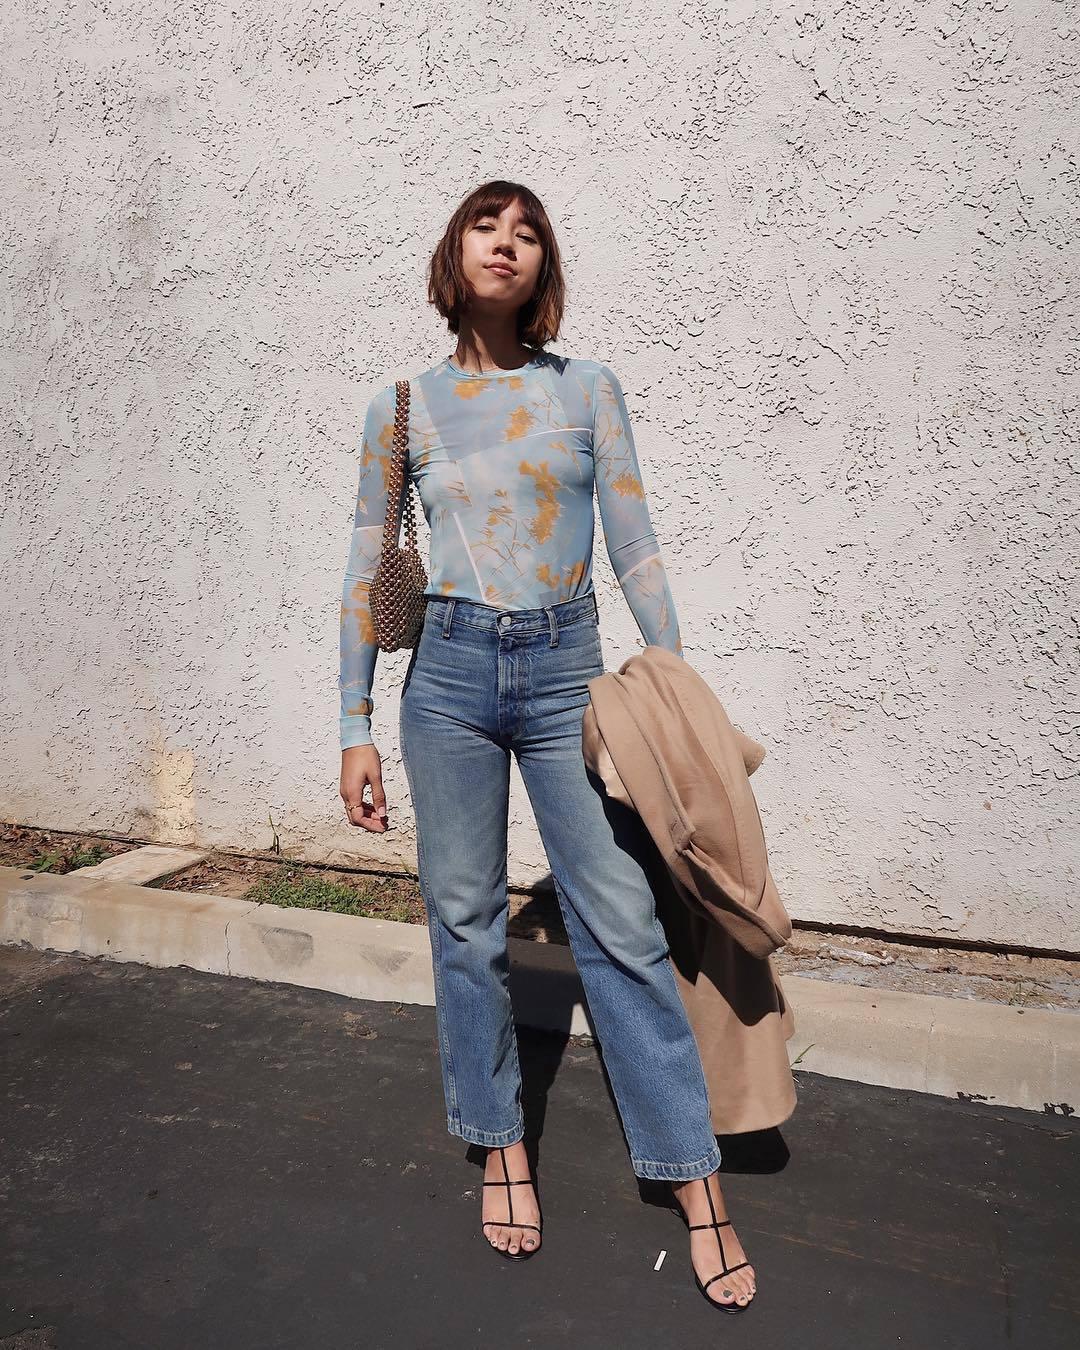 top mesh blue top long sleeves straight jeans high waisted jeans black sandals camel coat shoulder bag